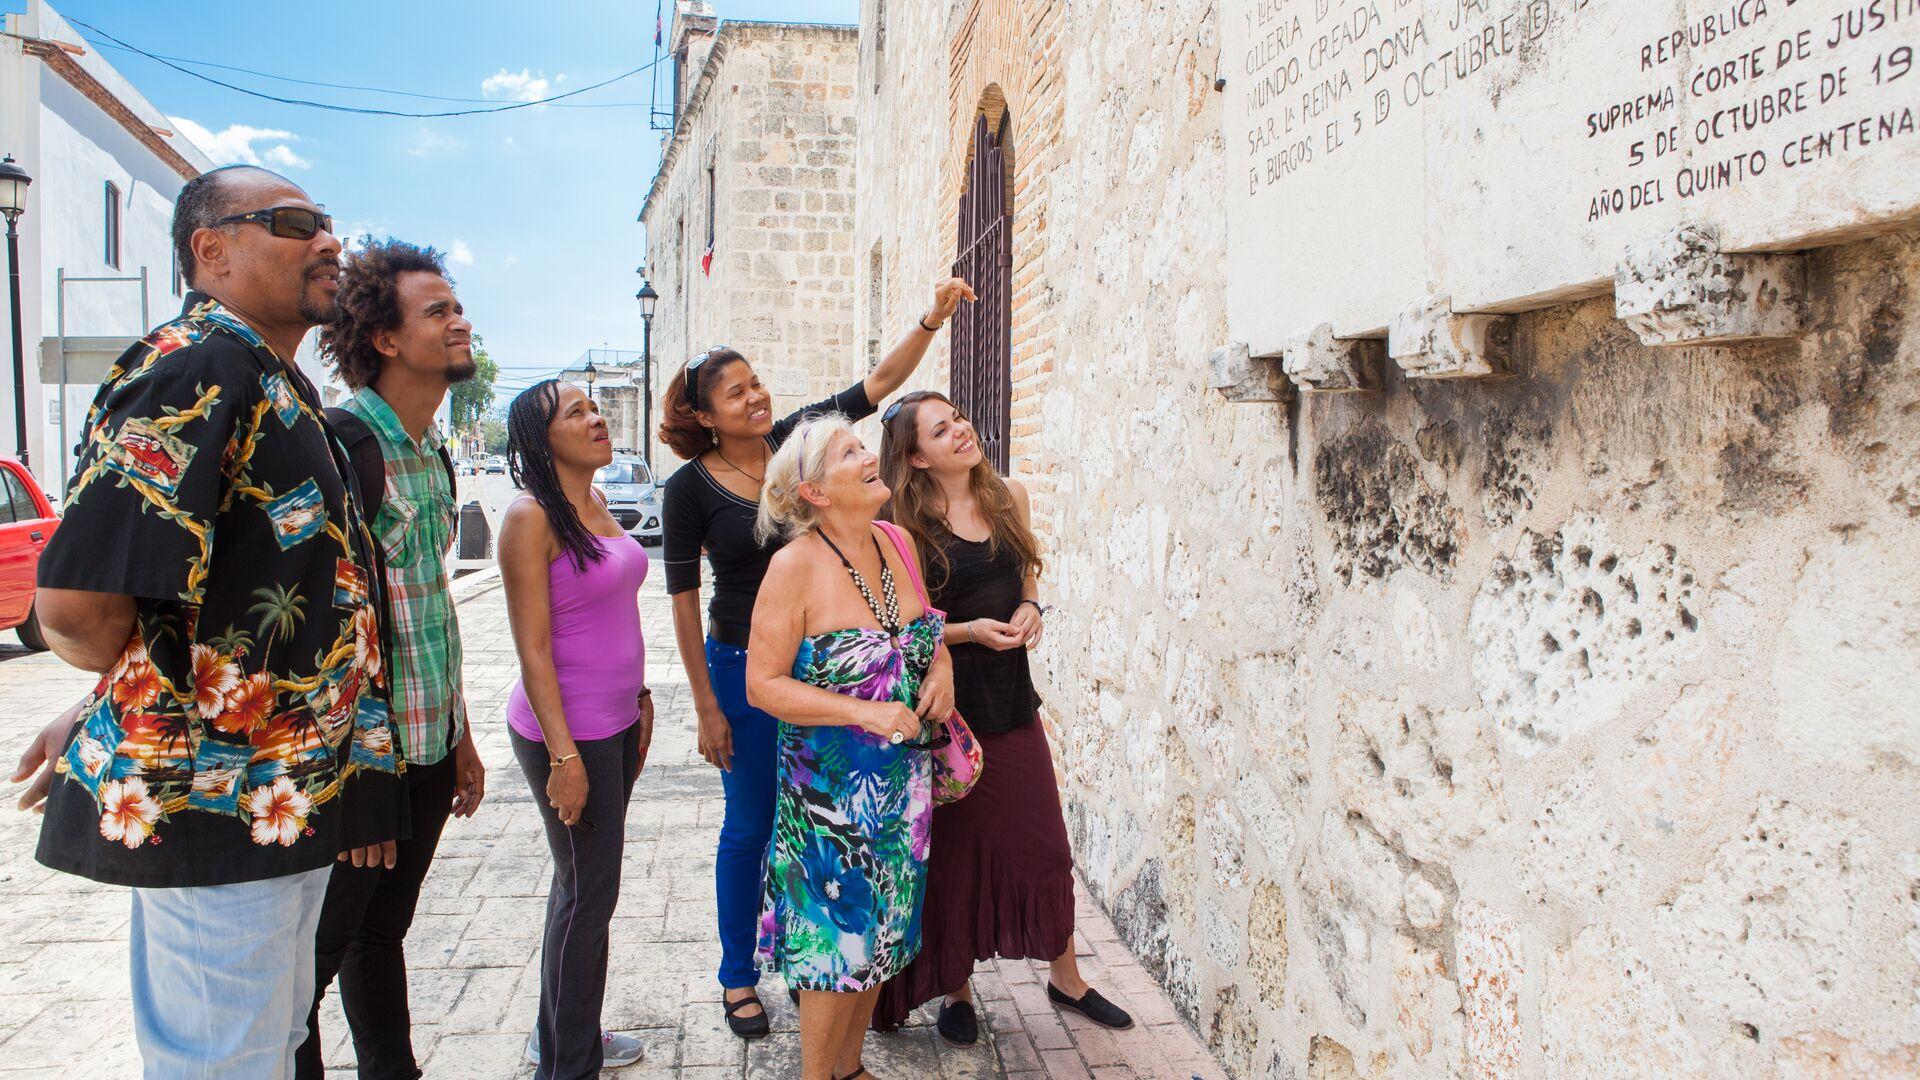 Sprachaufenthalt Dominikanische Republik - Santo Domingo - Instituto Intercultura Santo Domingo - Schule